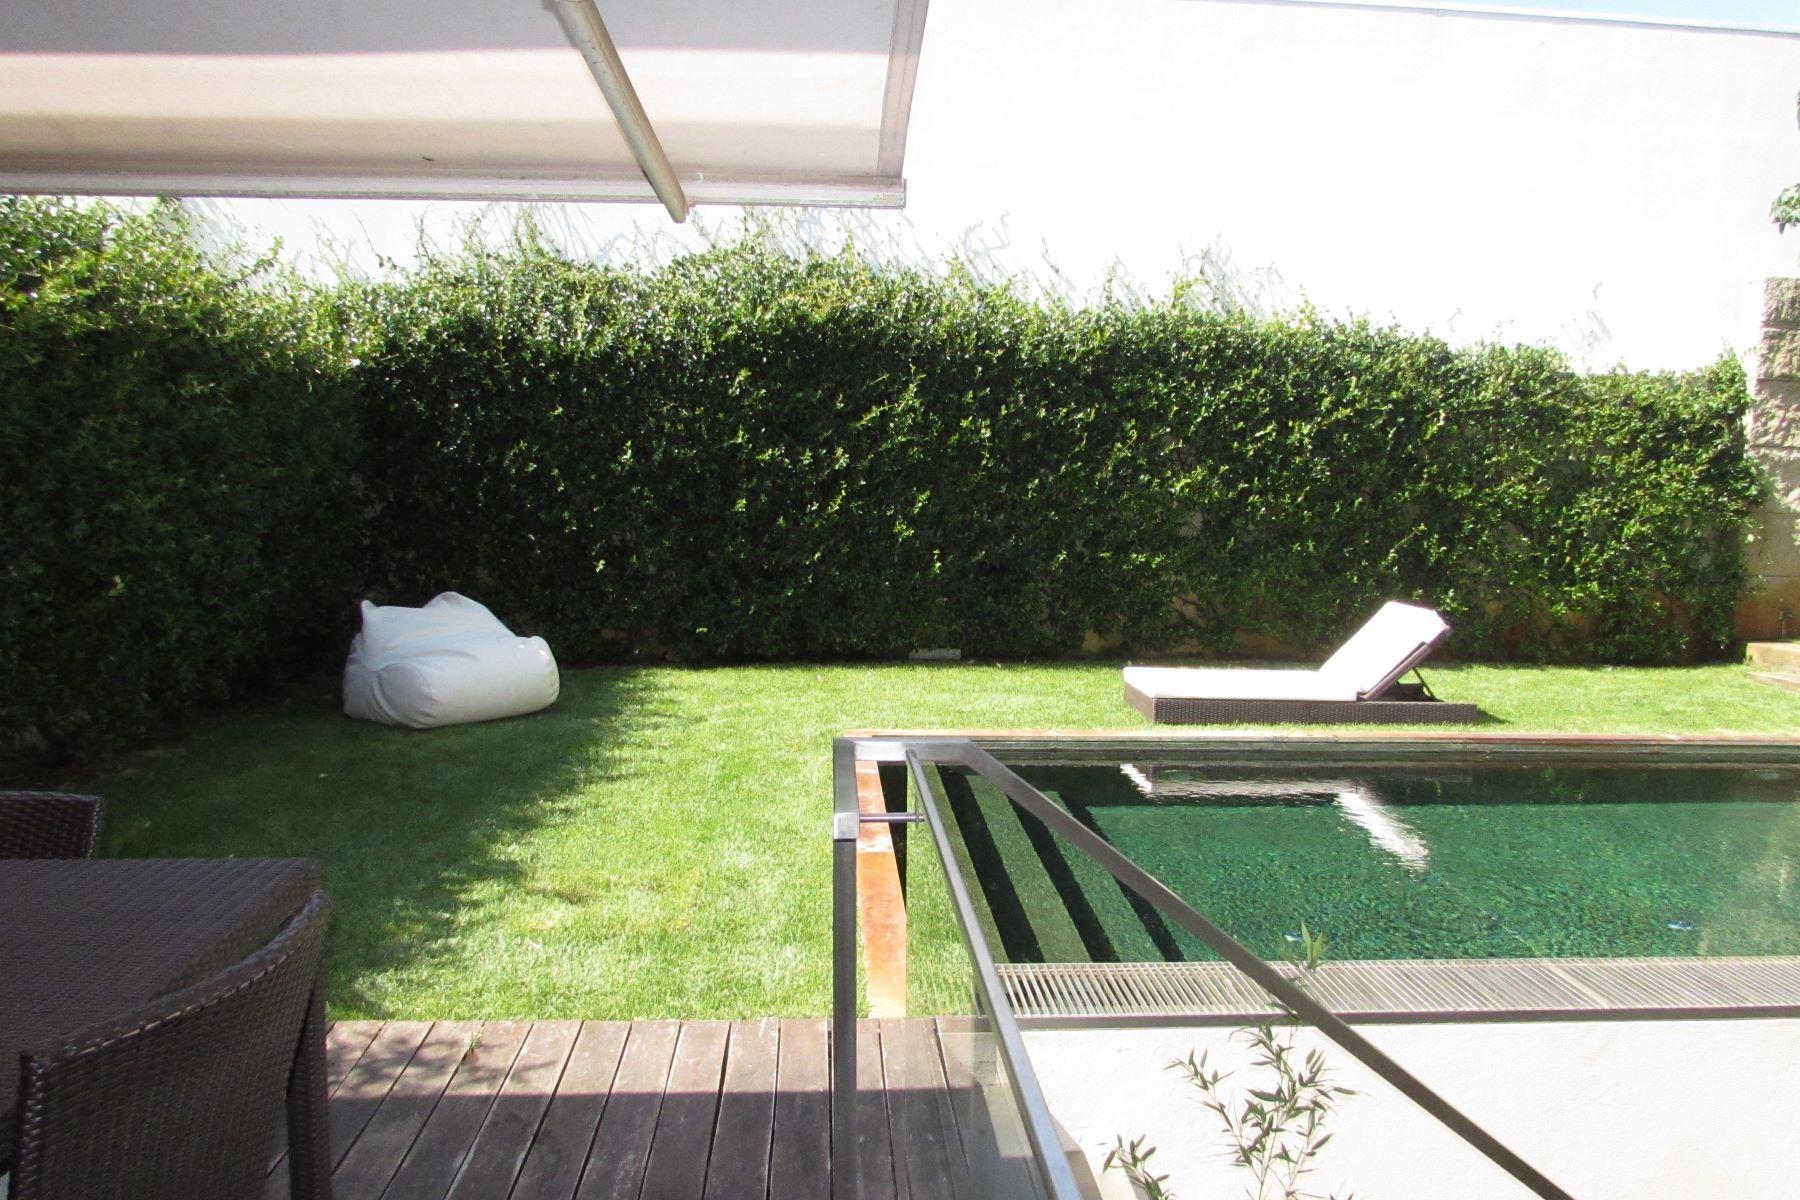 独户住宅 为 销售 在 Semi-detached house, 6 bedrooms, for Sale 波尔图, 波尔图, 葡萄牙